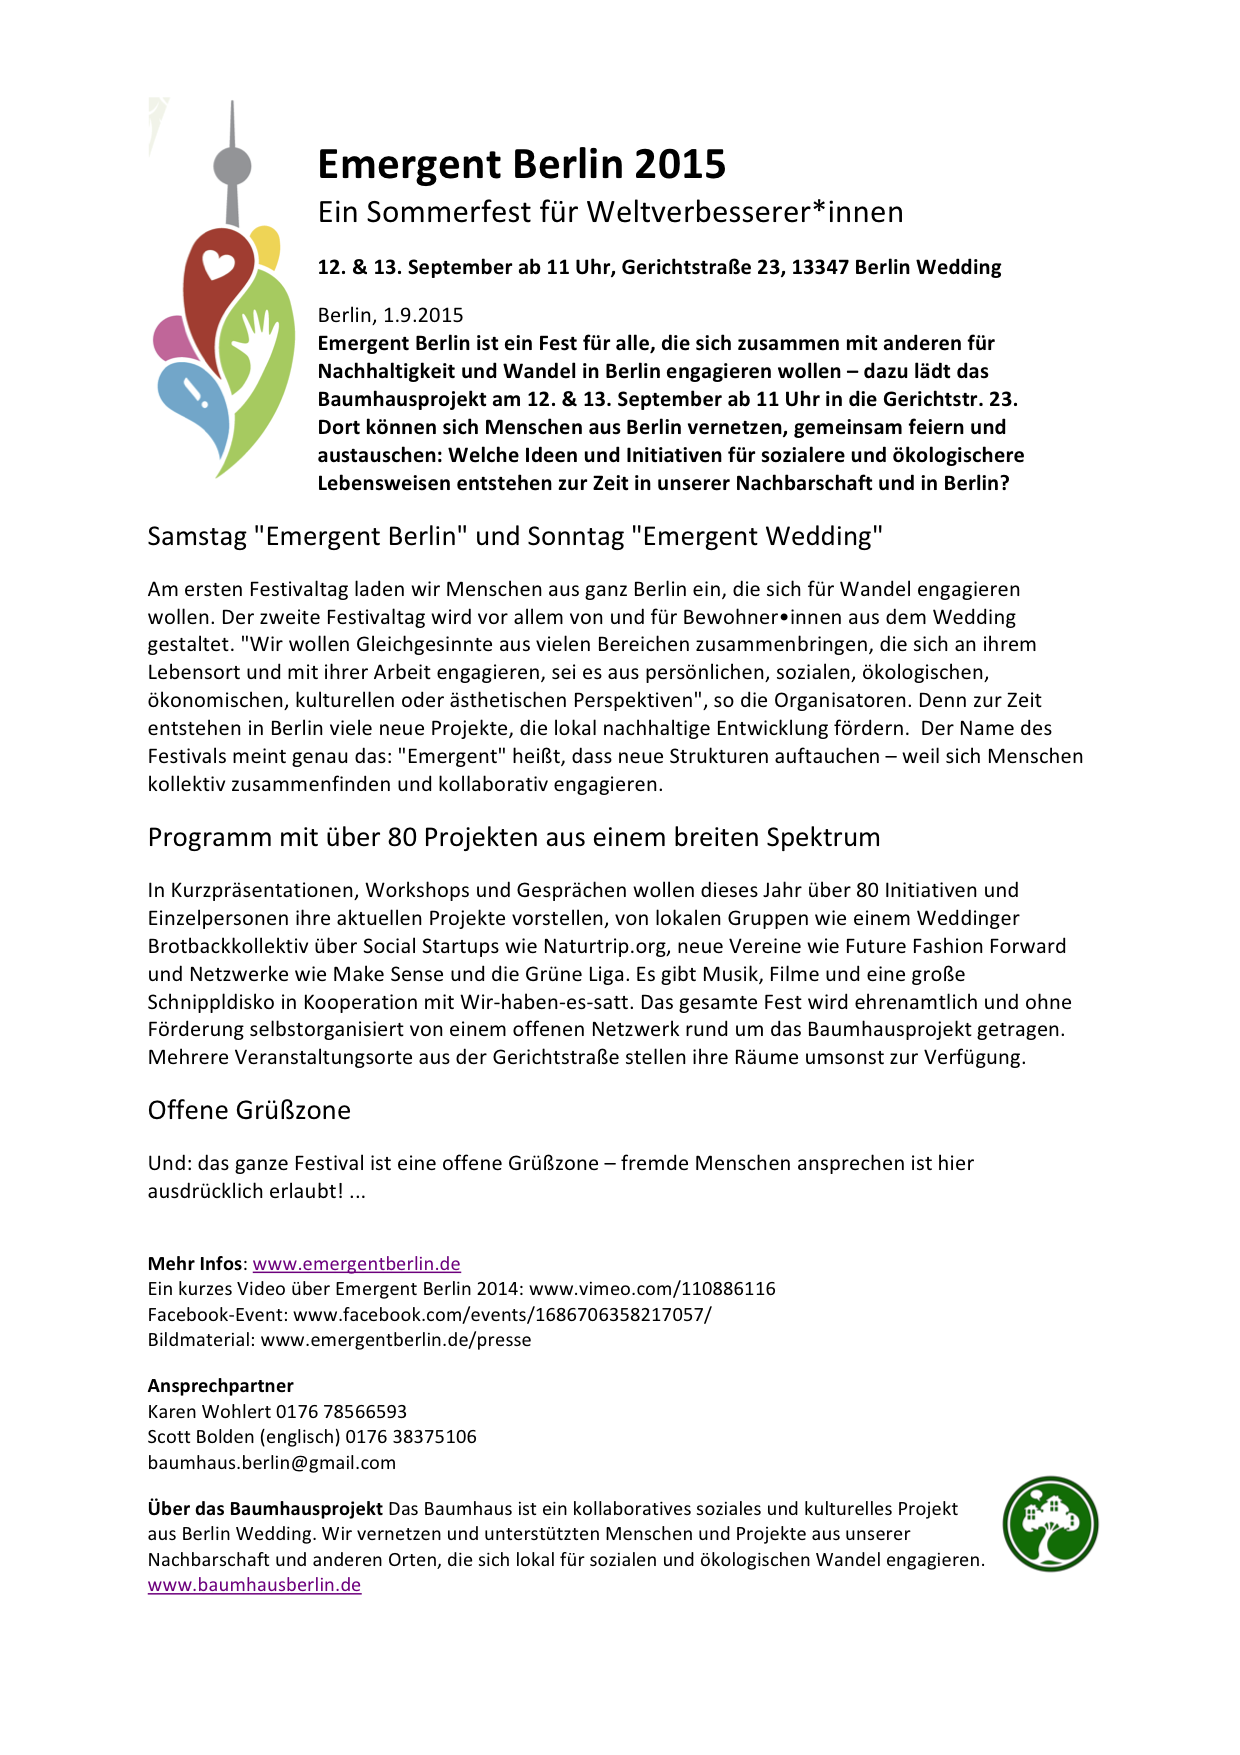 Presse-Info Emergent Berlin 2015